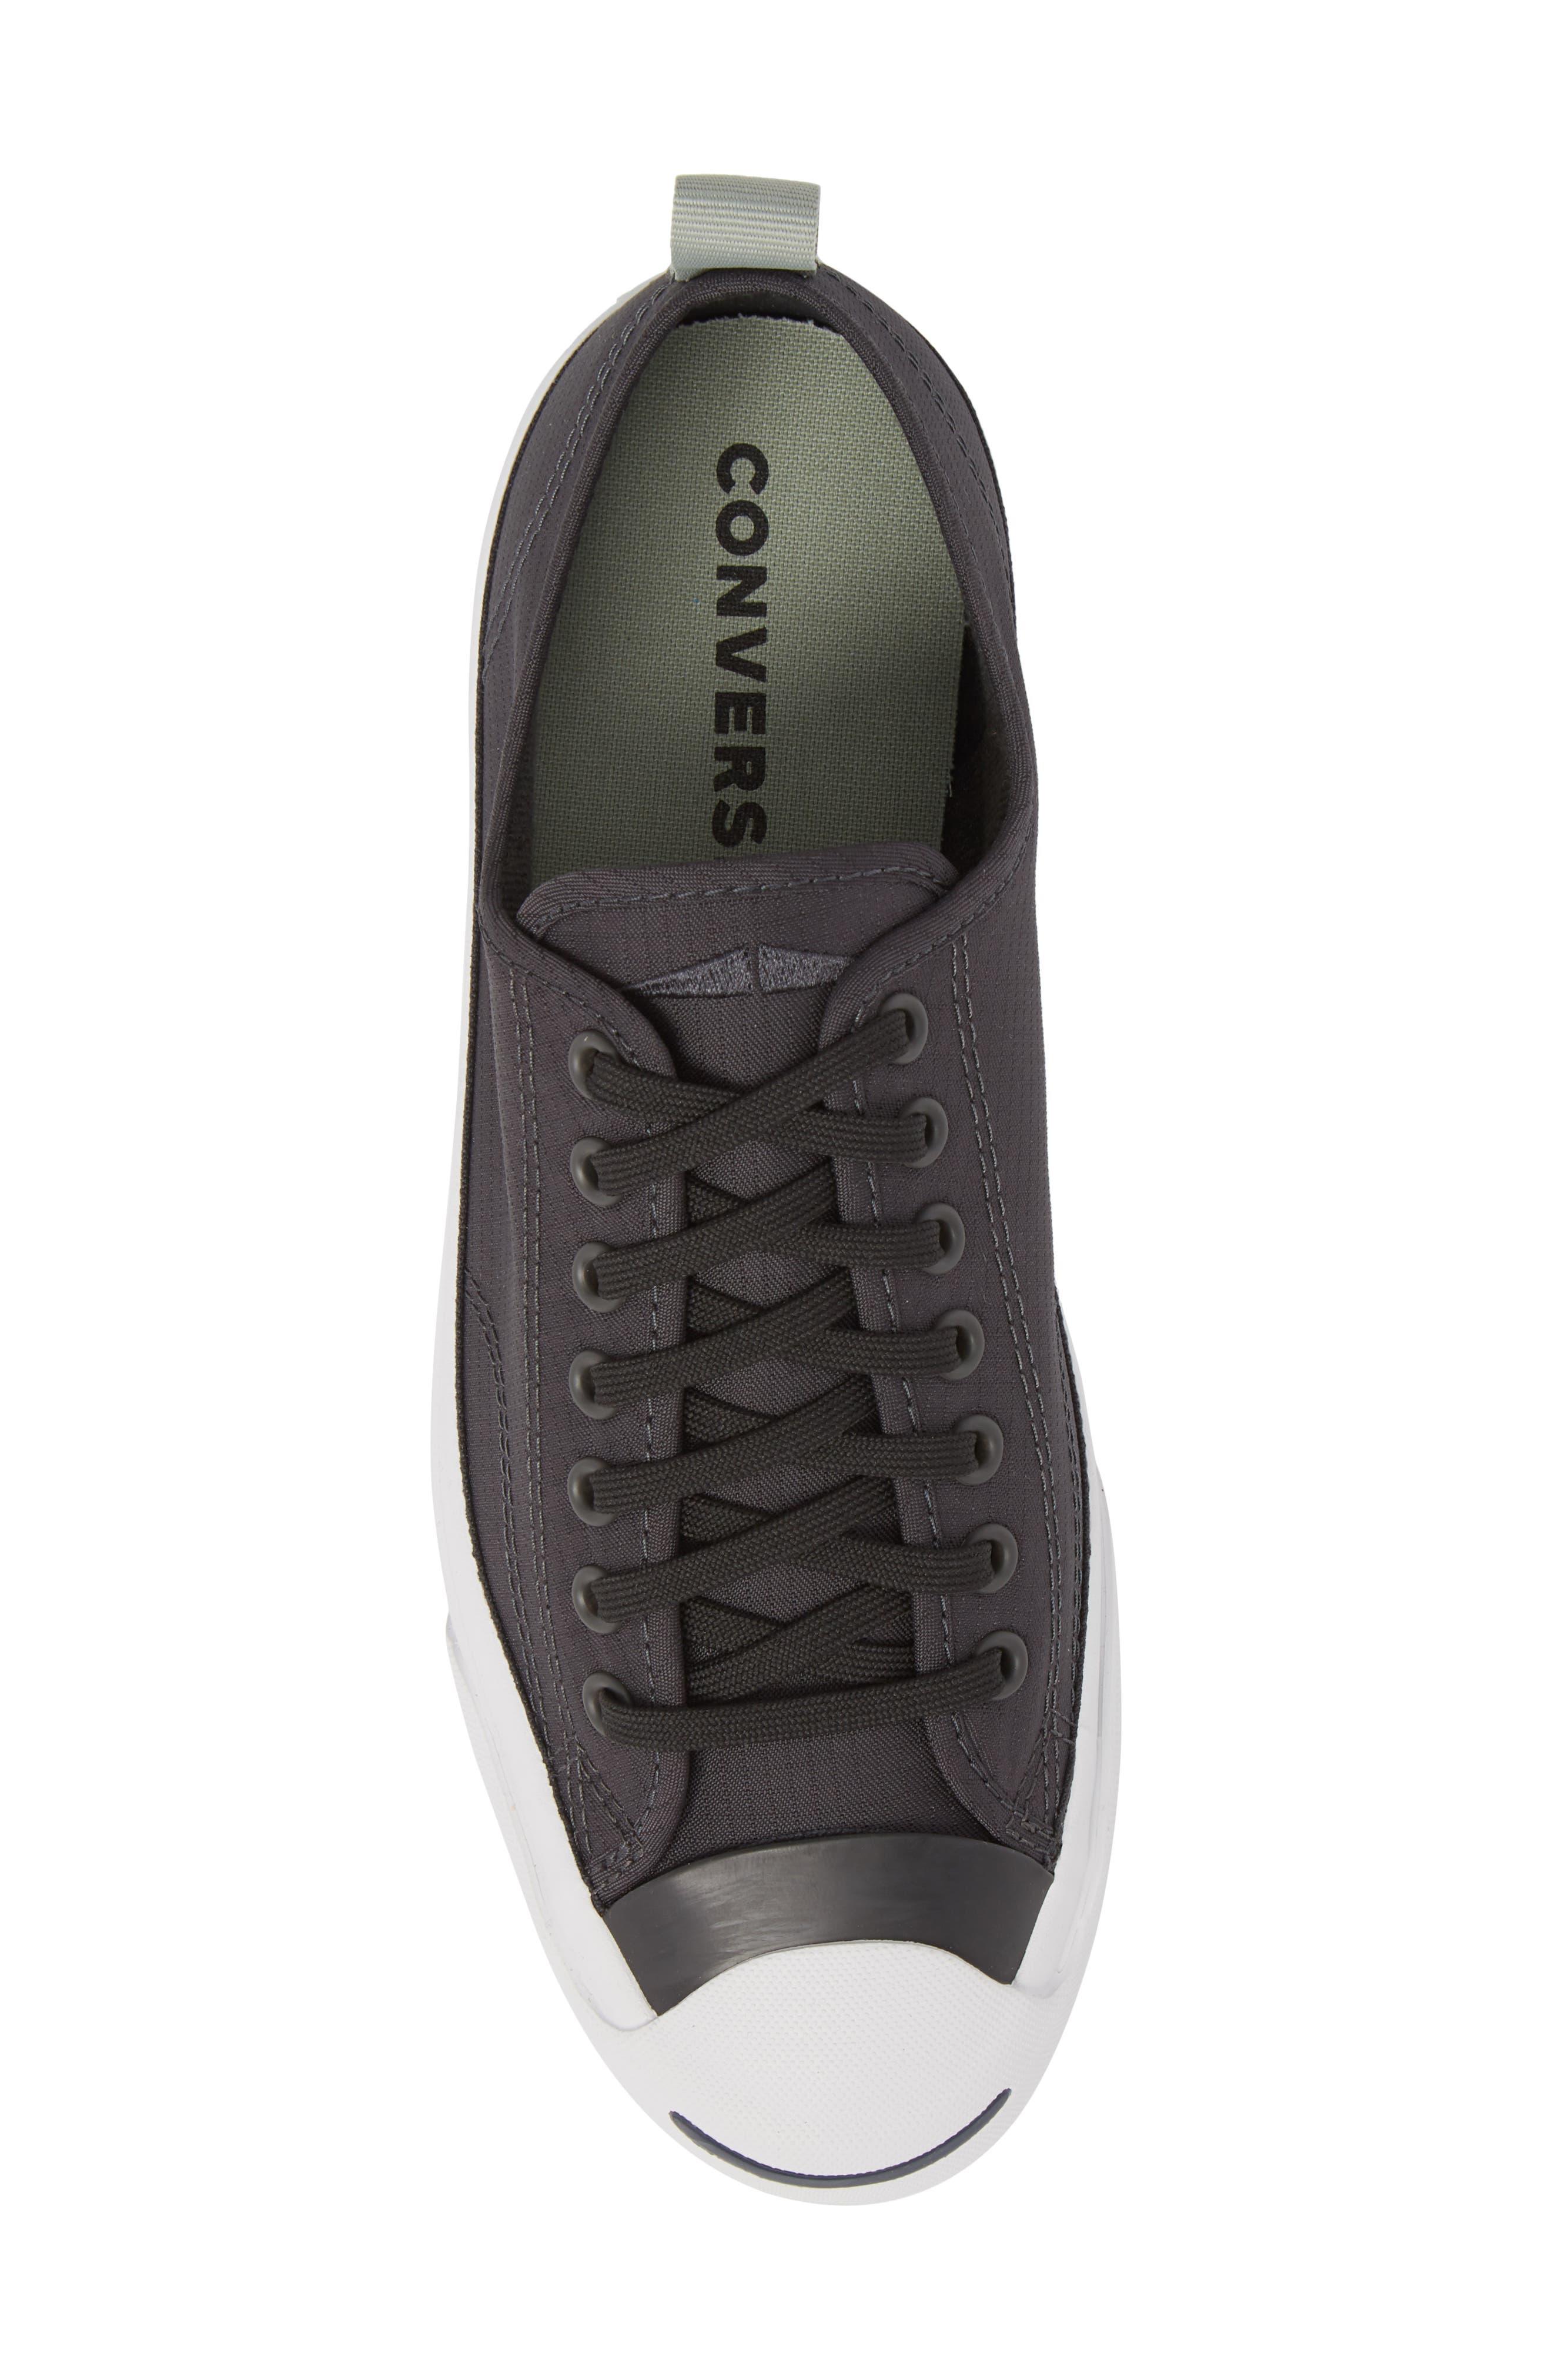 Jack Purcell Ripstop Sneaker,                             Alternate thumbnail 5, color,                             Black